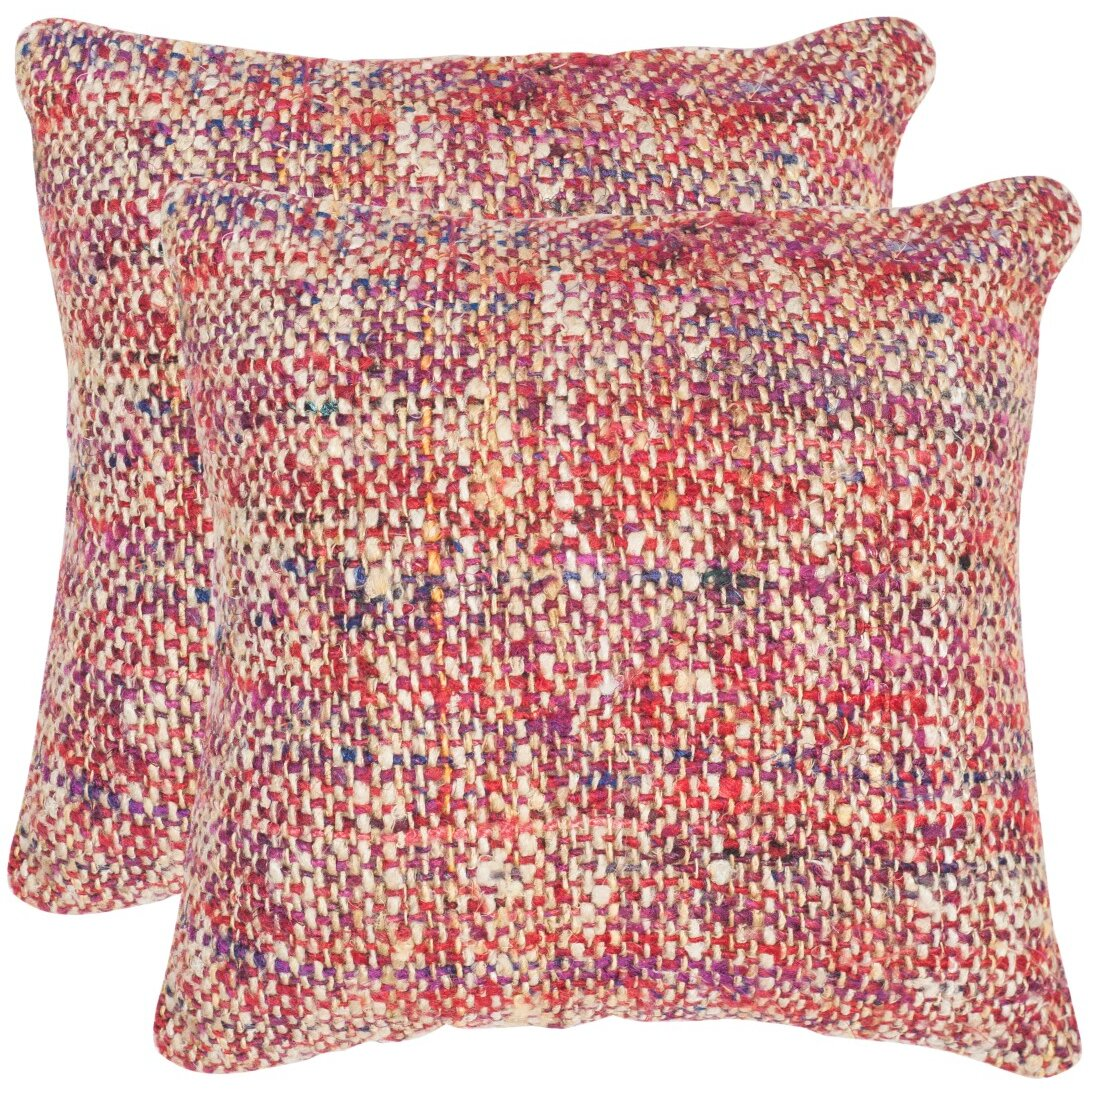 brayden studio longoria silk throw pillow  reviews  wayfair - brayden studioreg longoria silk throw pillow